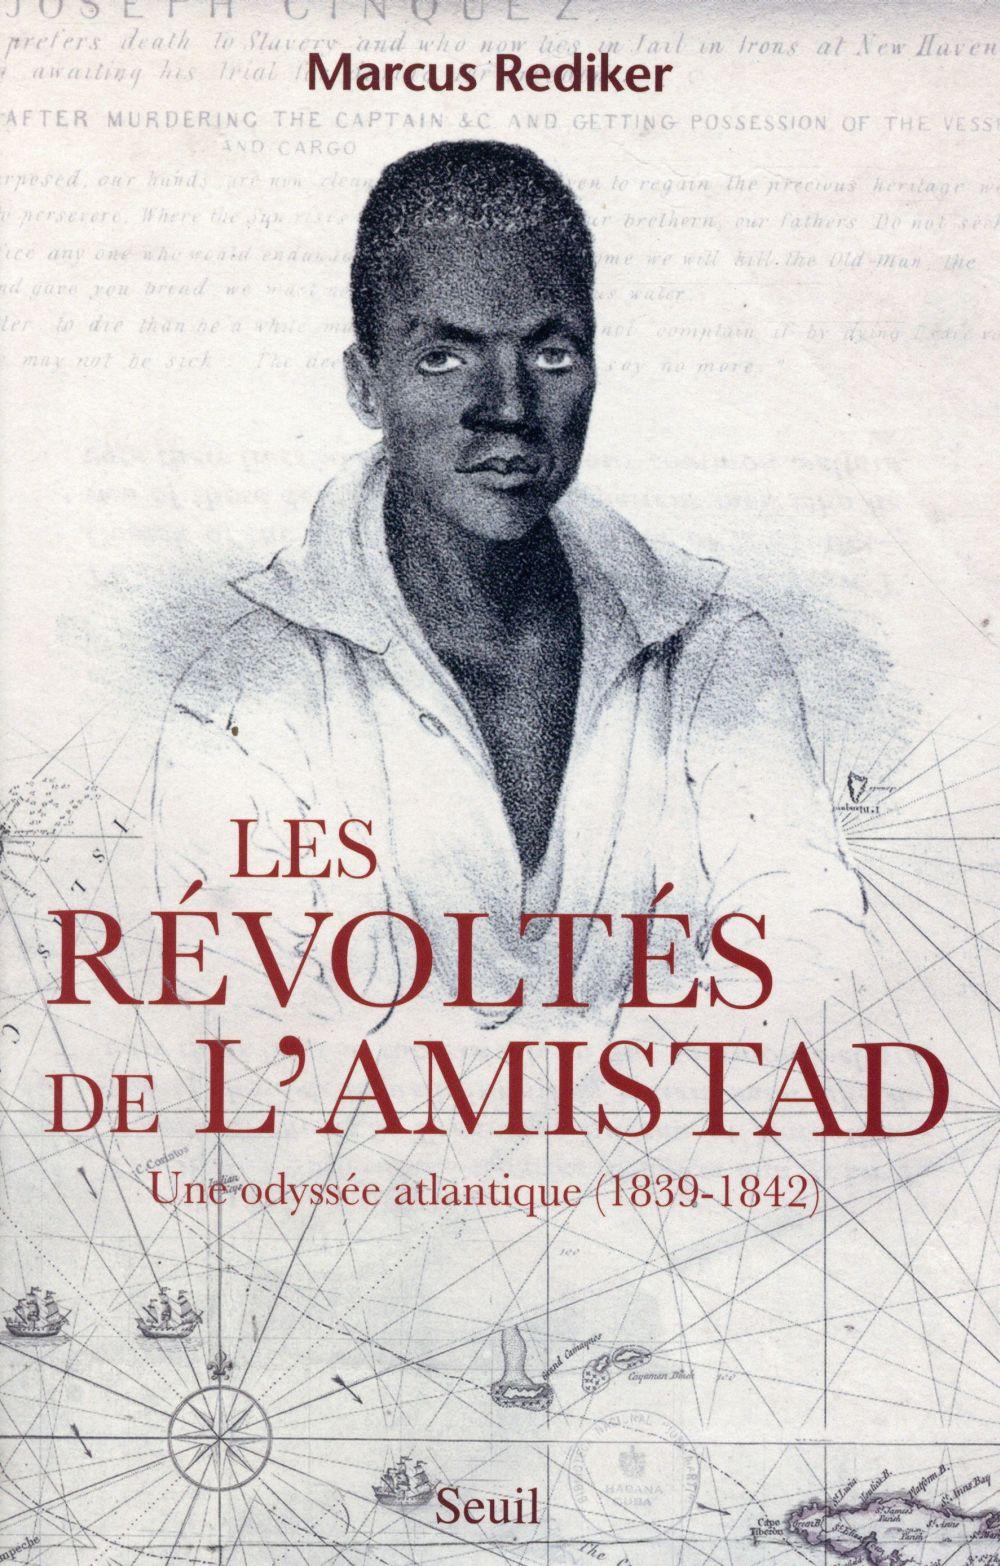 LES REVOLTES DE L'AMISTAD. UNE ODYSSEE ATLANTIQUE (1839-1842)